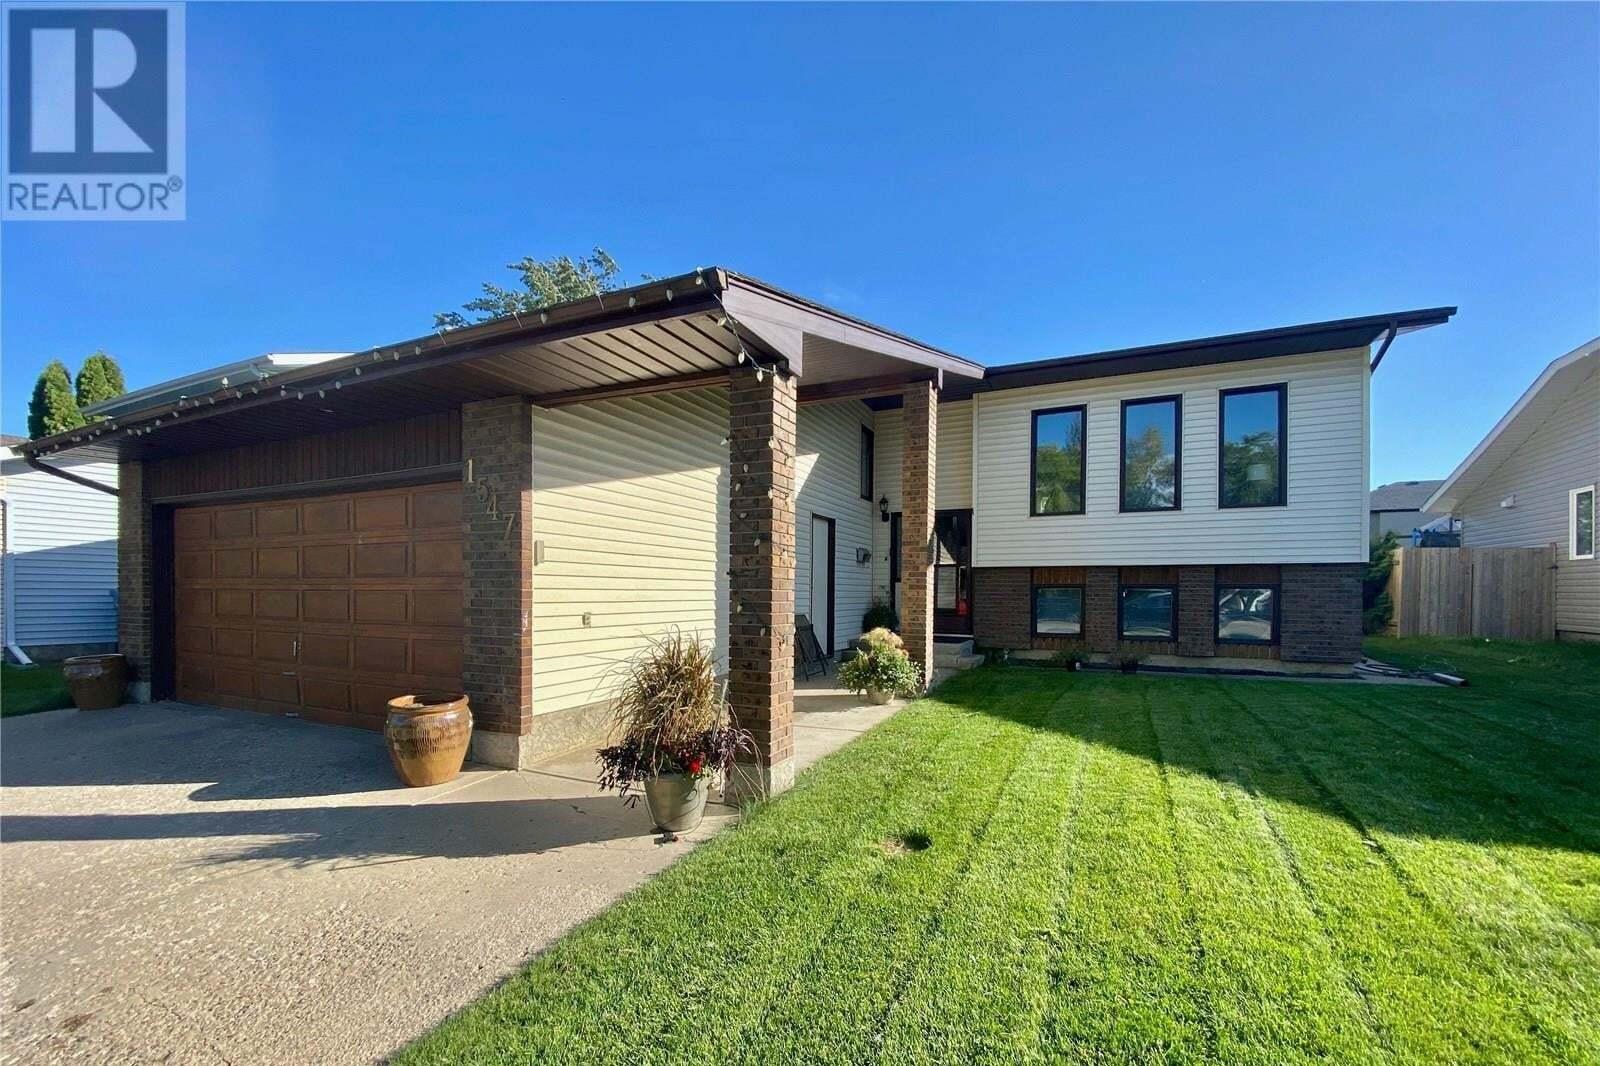 House for sale at 1547 Barton Dr Prince Albert Saskatchewan - MLS: SK826771